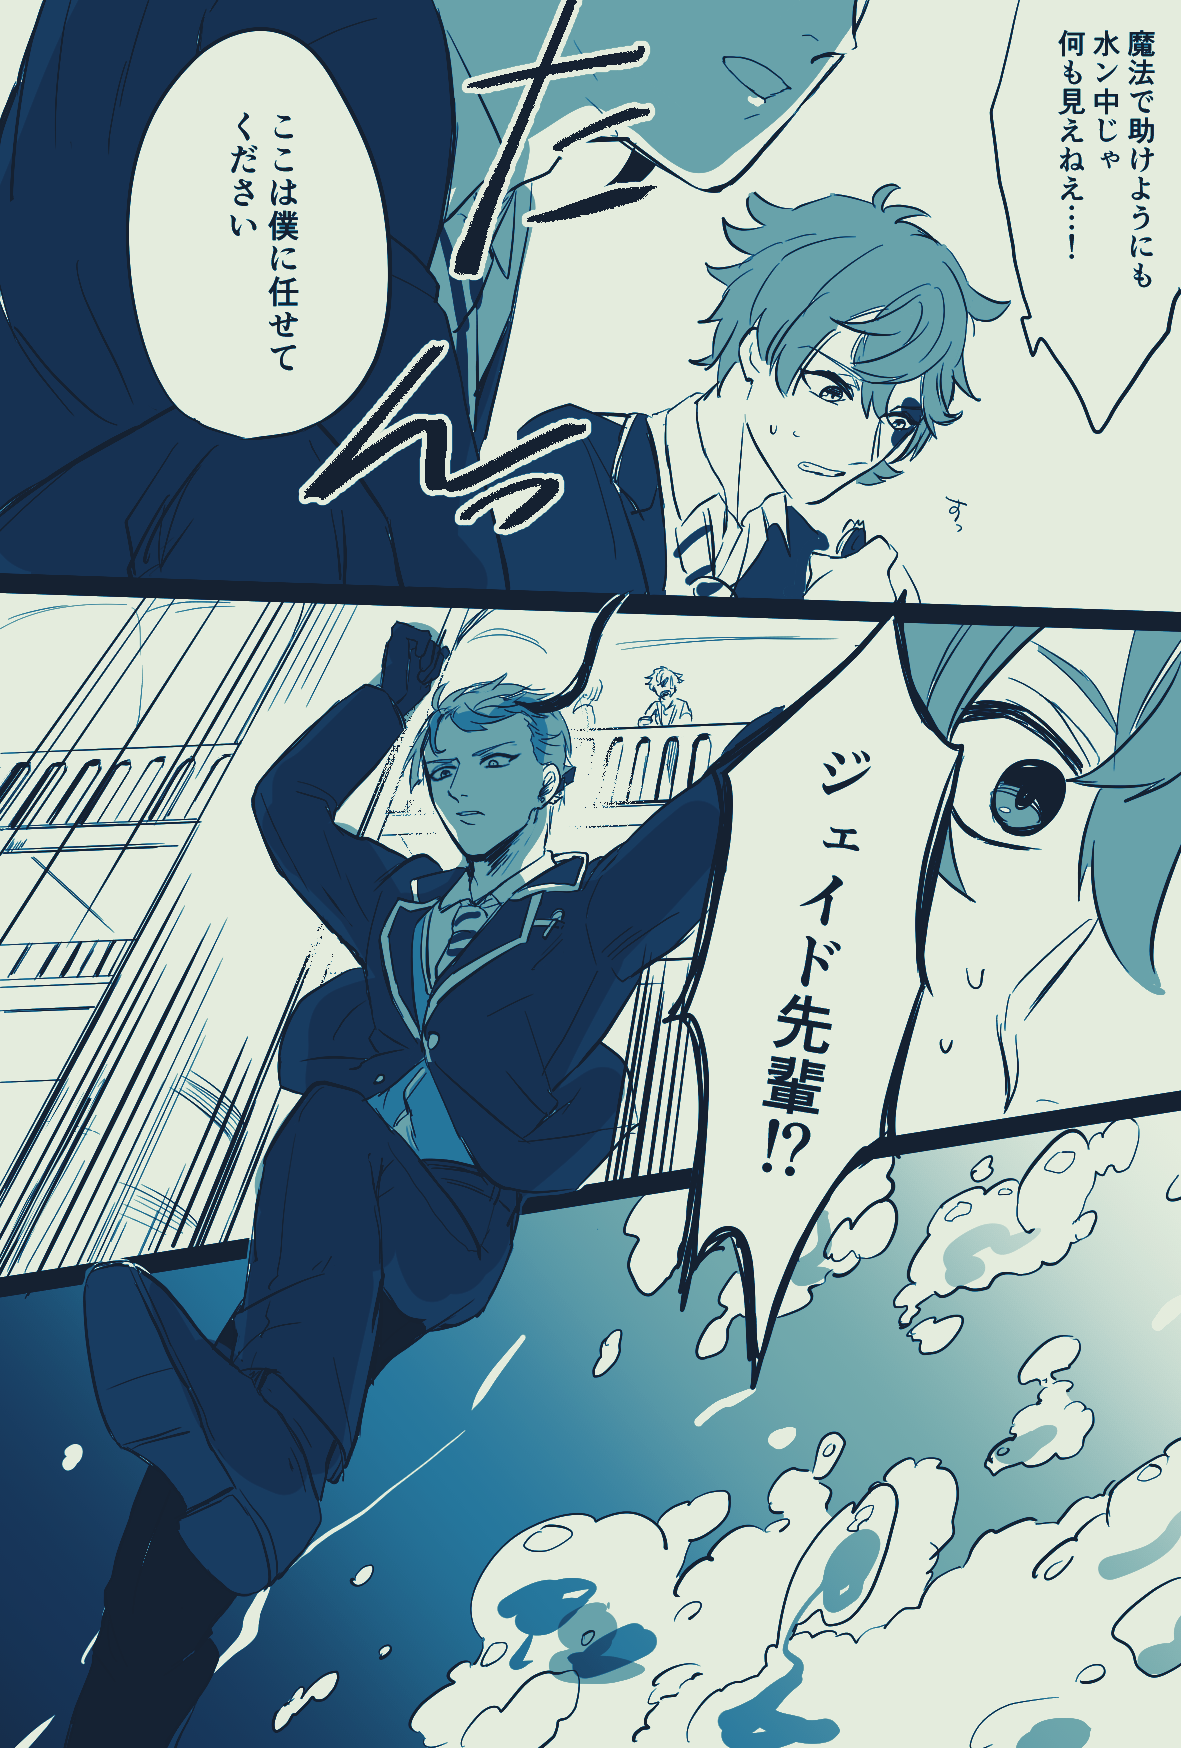 twitter 漫画 人気 人魚 人魚 イラスト